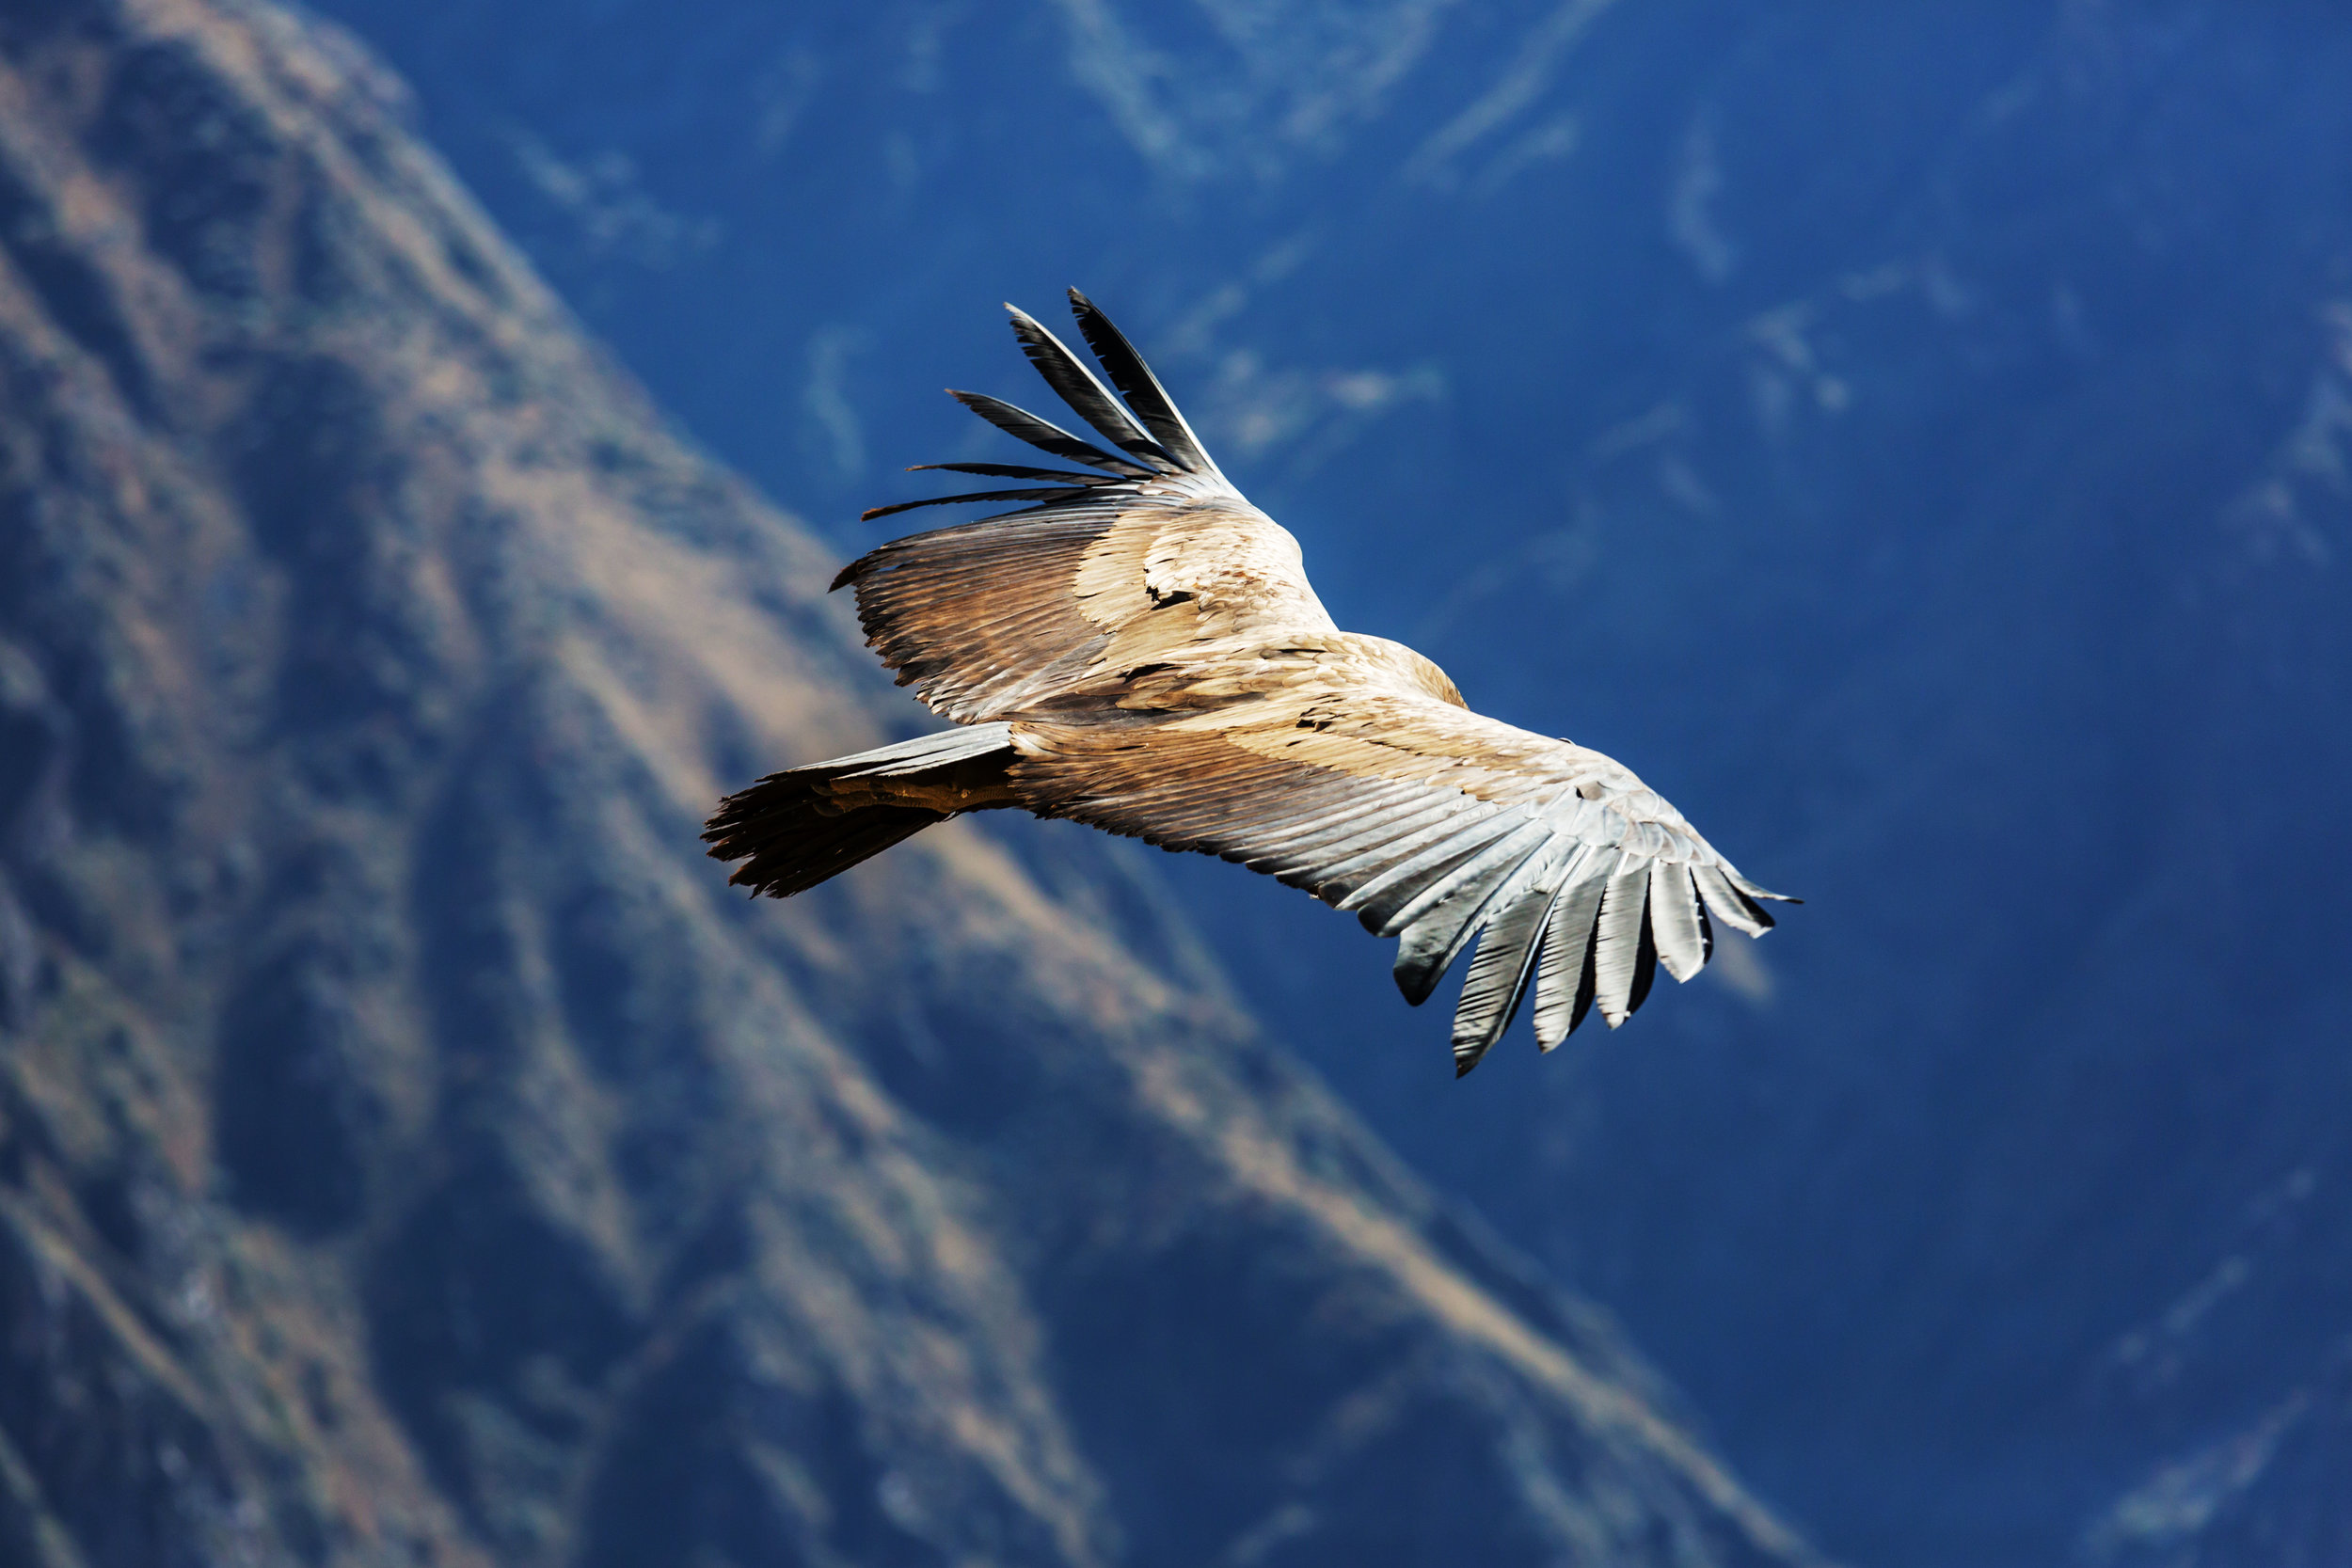 peru_colca_bigstock-Flying-condor-in-the-Colca-can-215109271.jpg